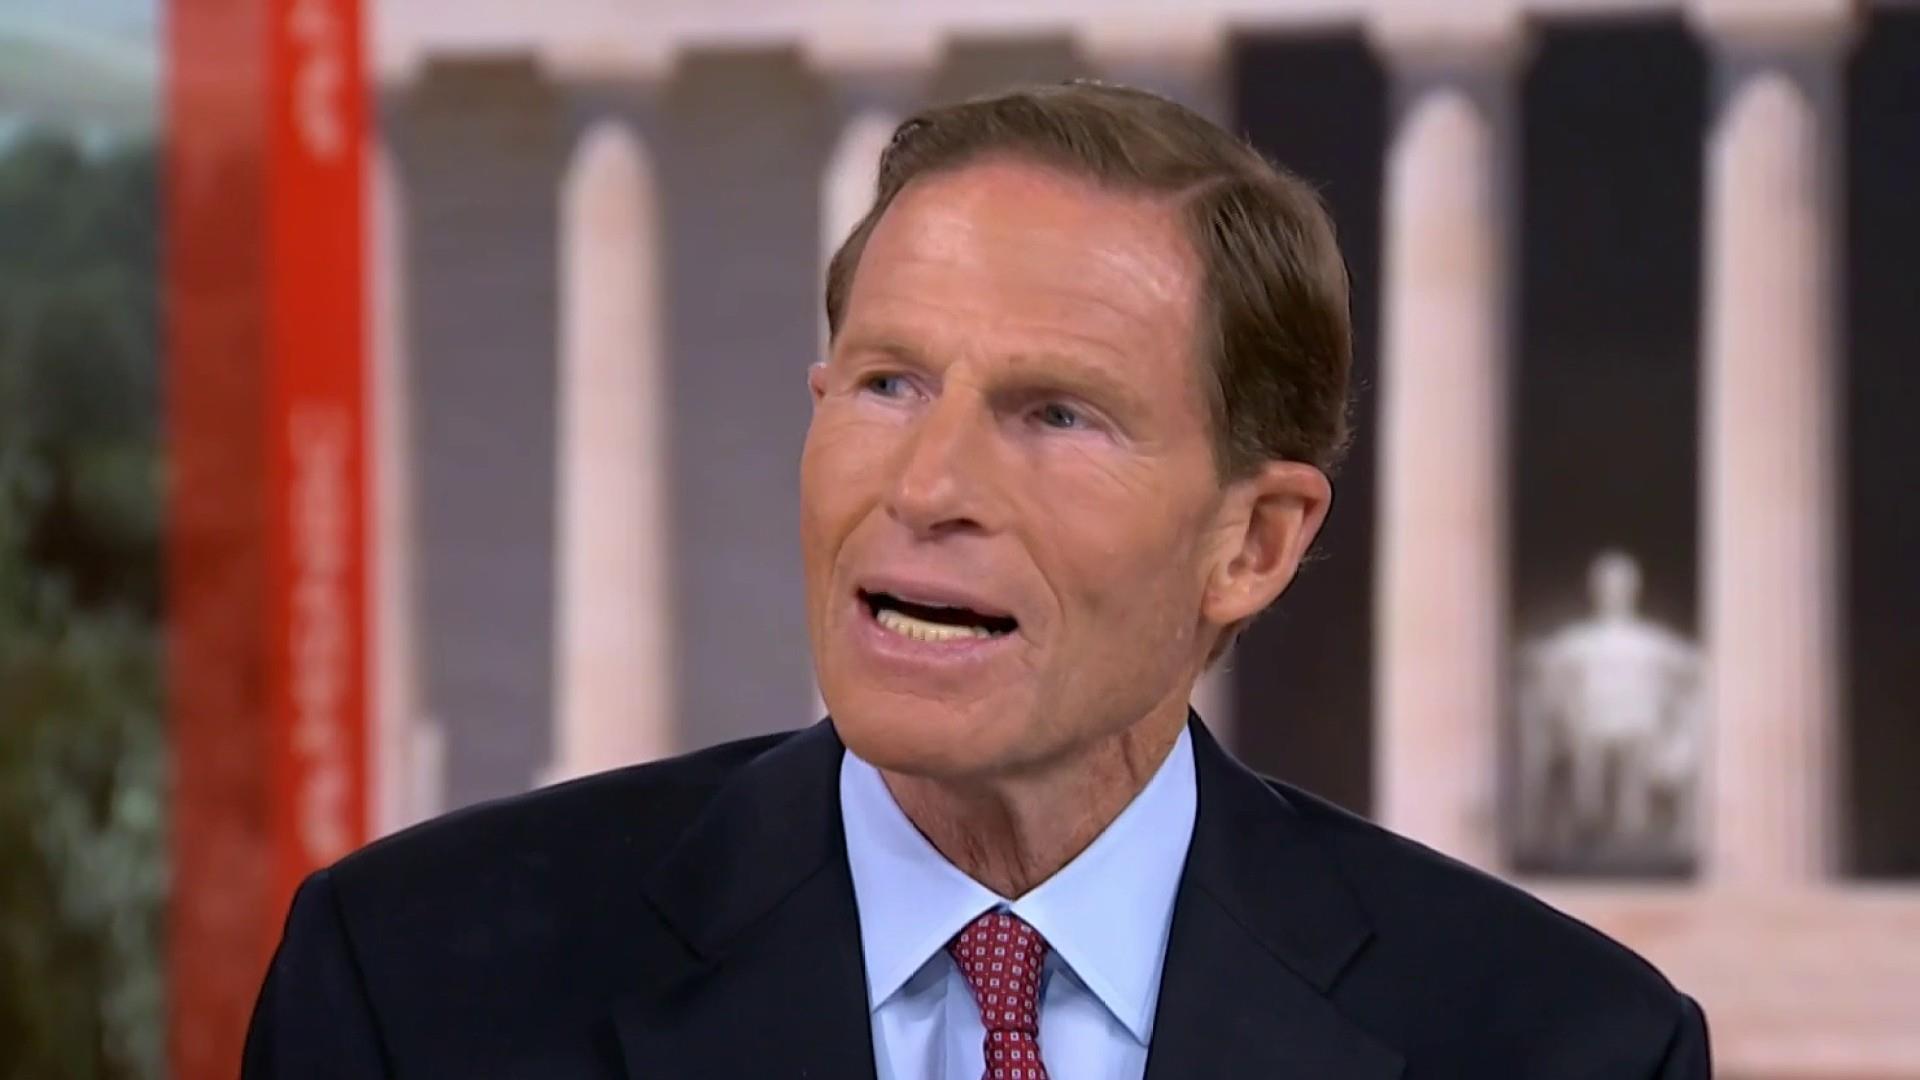 Sen. Blumenthal on Trump mocking Dr. Ford: Appalling